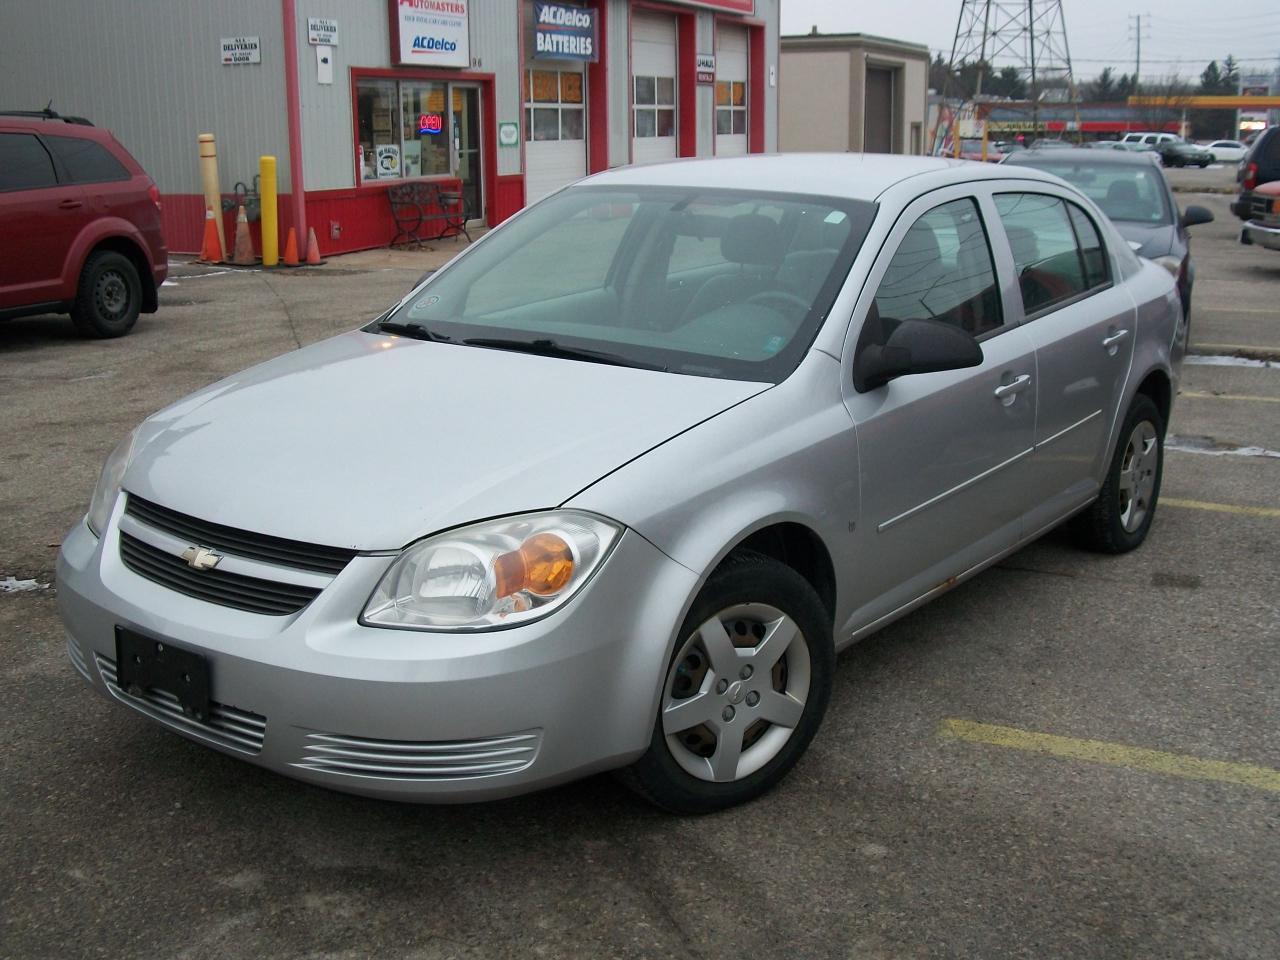 Photo of Silver 2006 Chevrolet Cobalt